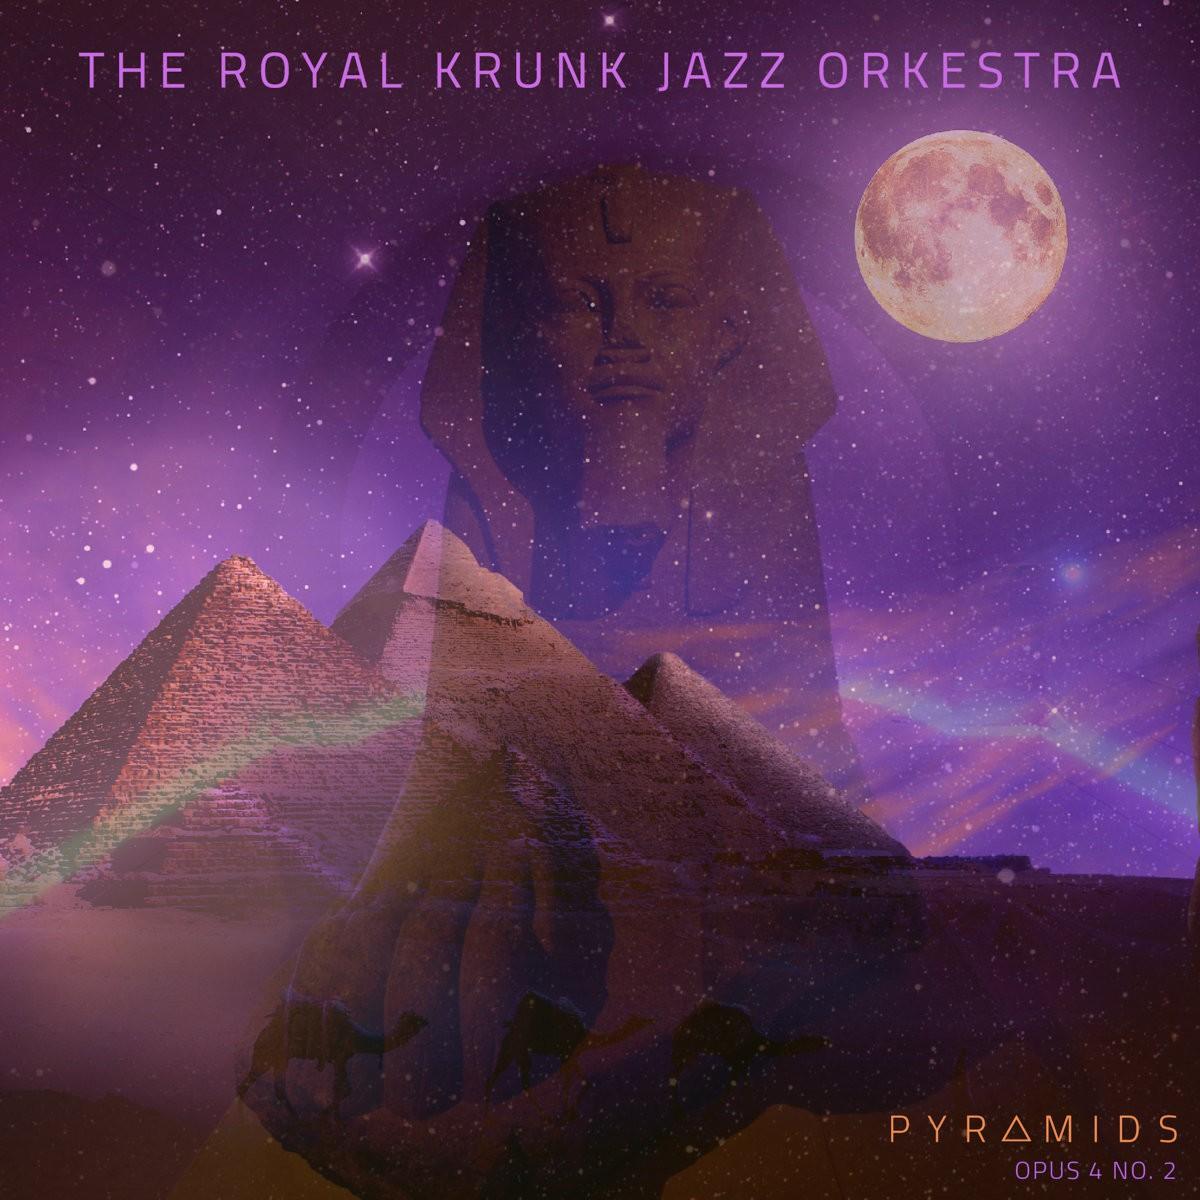 THE ROYAL KRUNK JAZZ ORCHESTRA - Pyramids: Opus 4 No. 2 cover